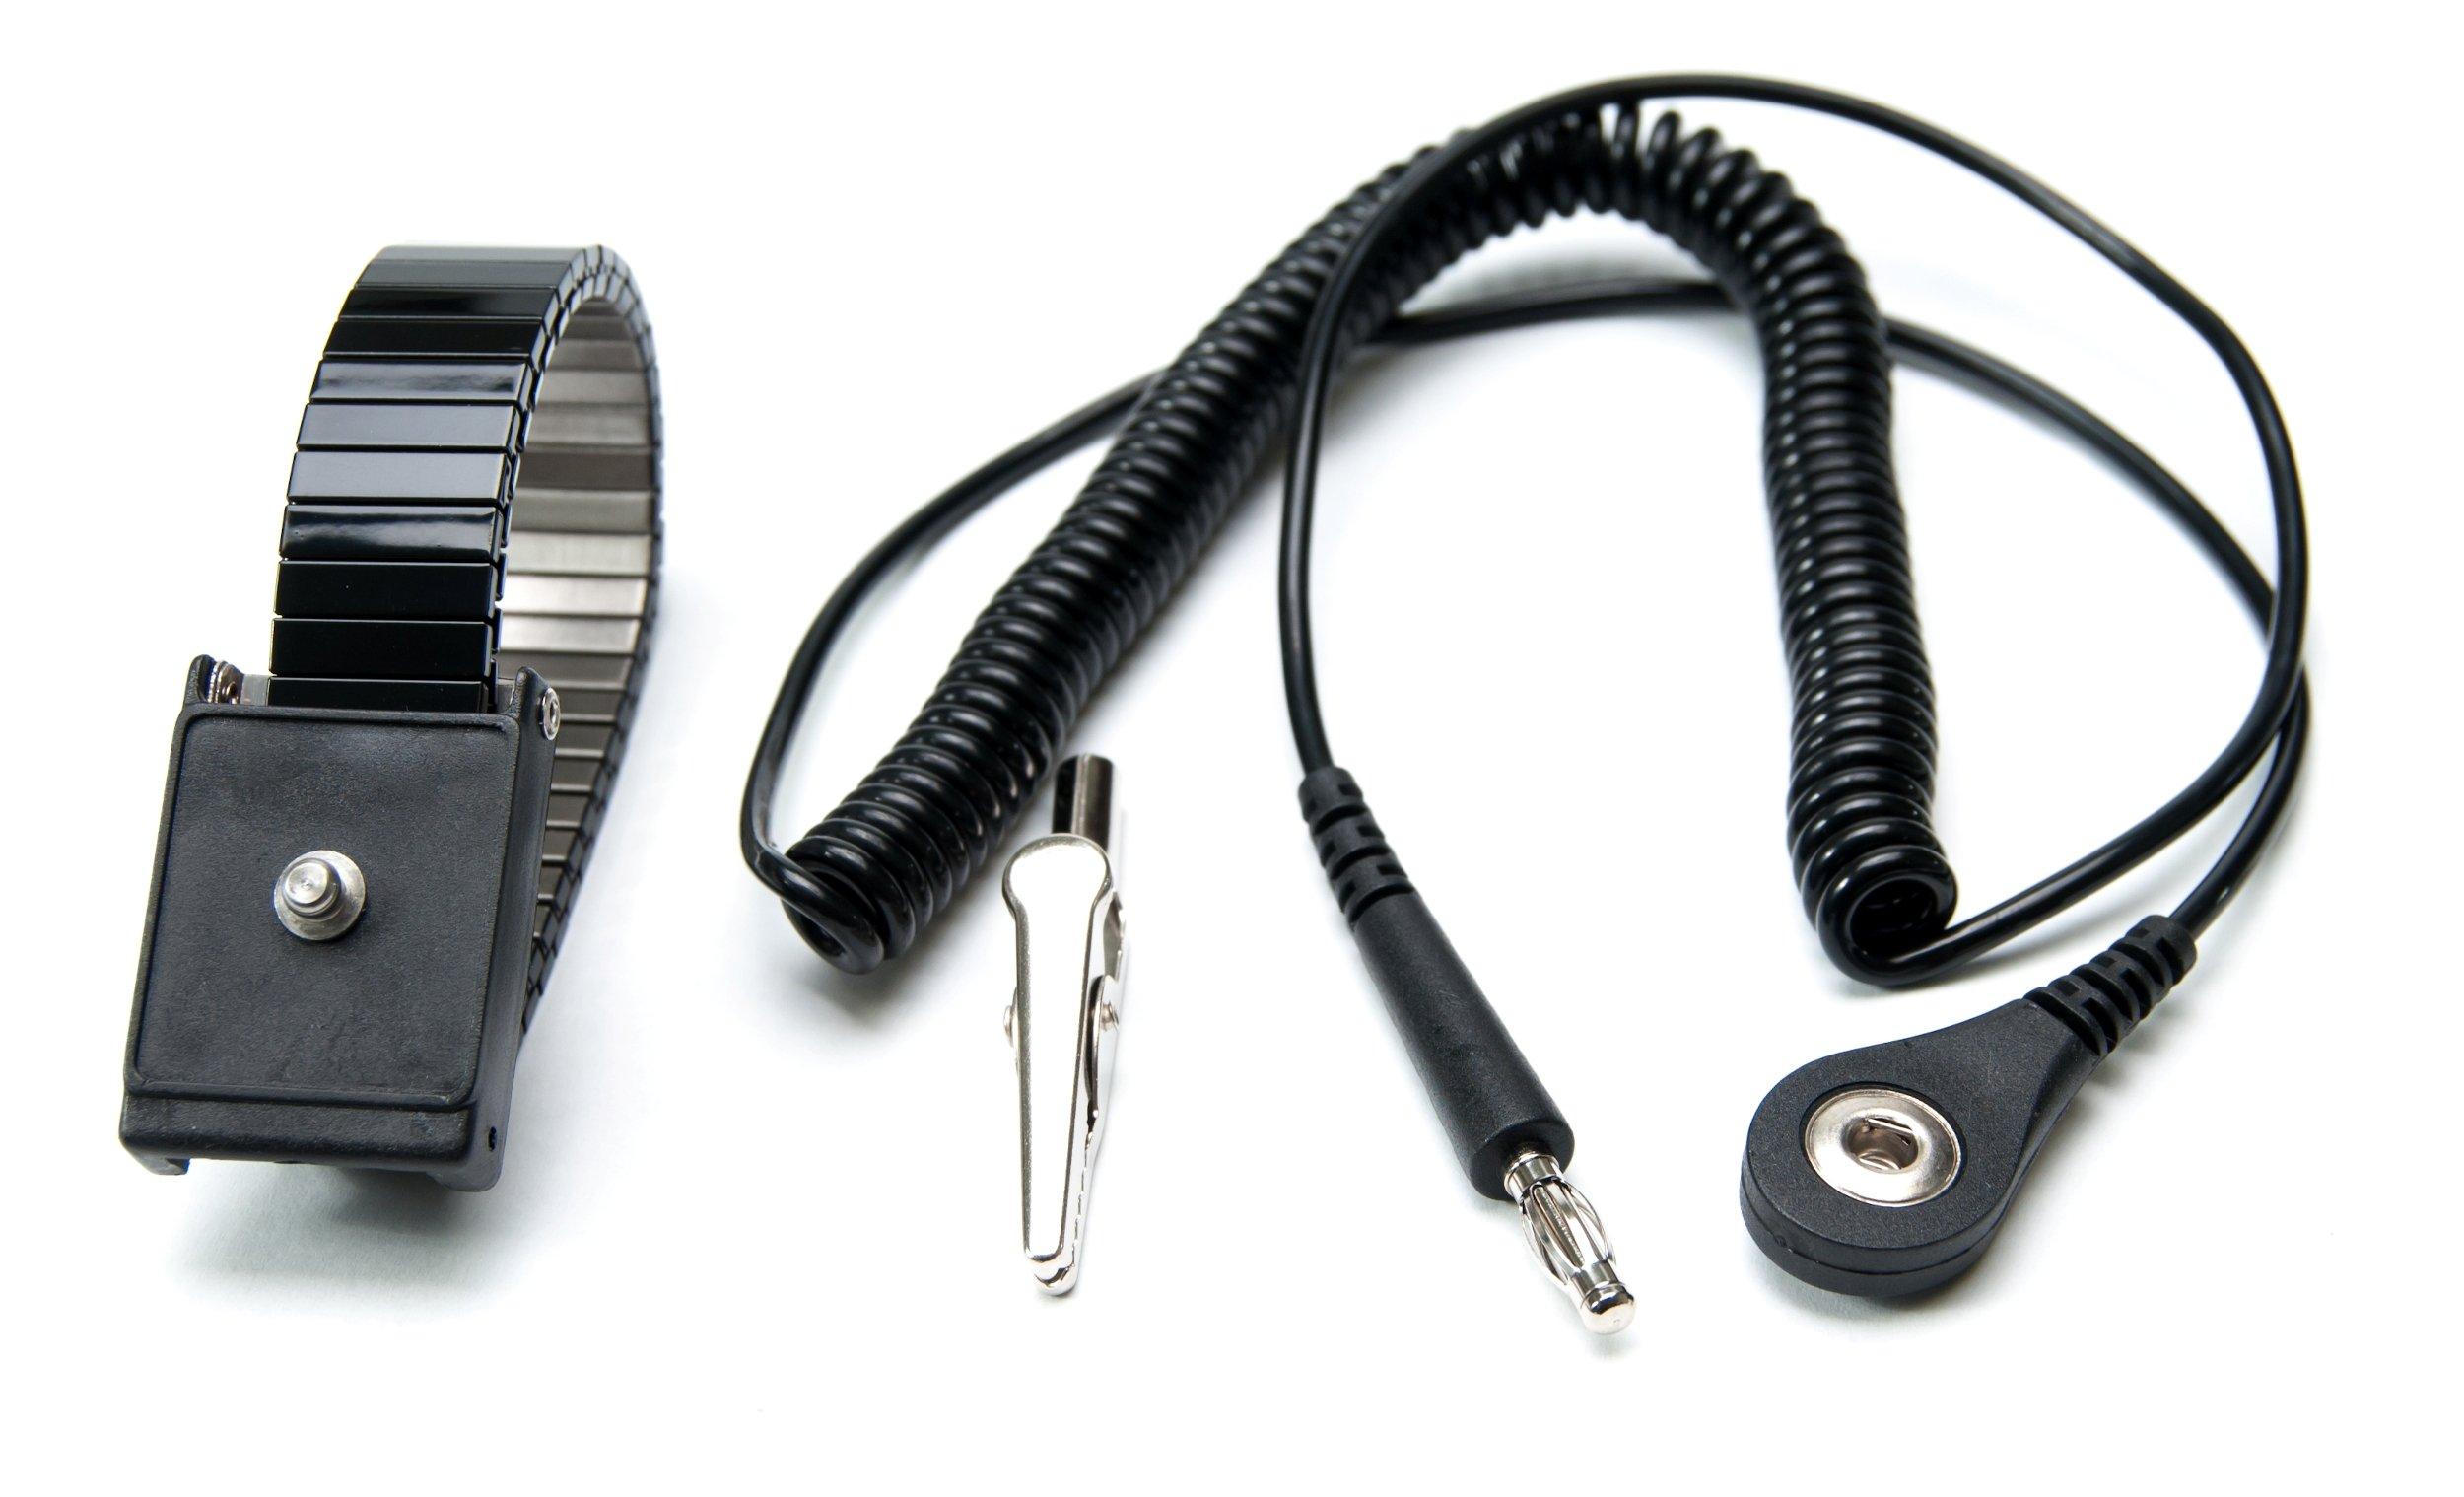 Bertech Metal Adjustable Swivel Wrist Strap with 12' Cord, 1 Megohm Resistor, 4mm Snap, Black